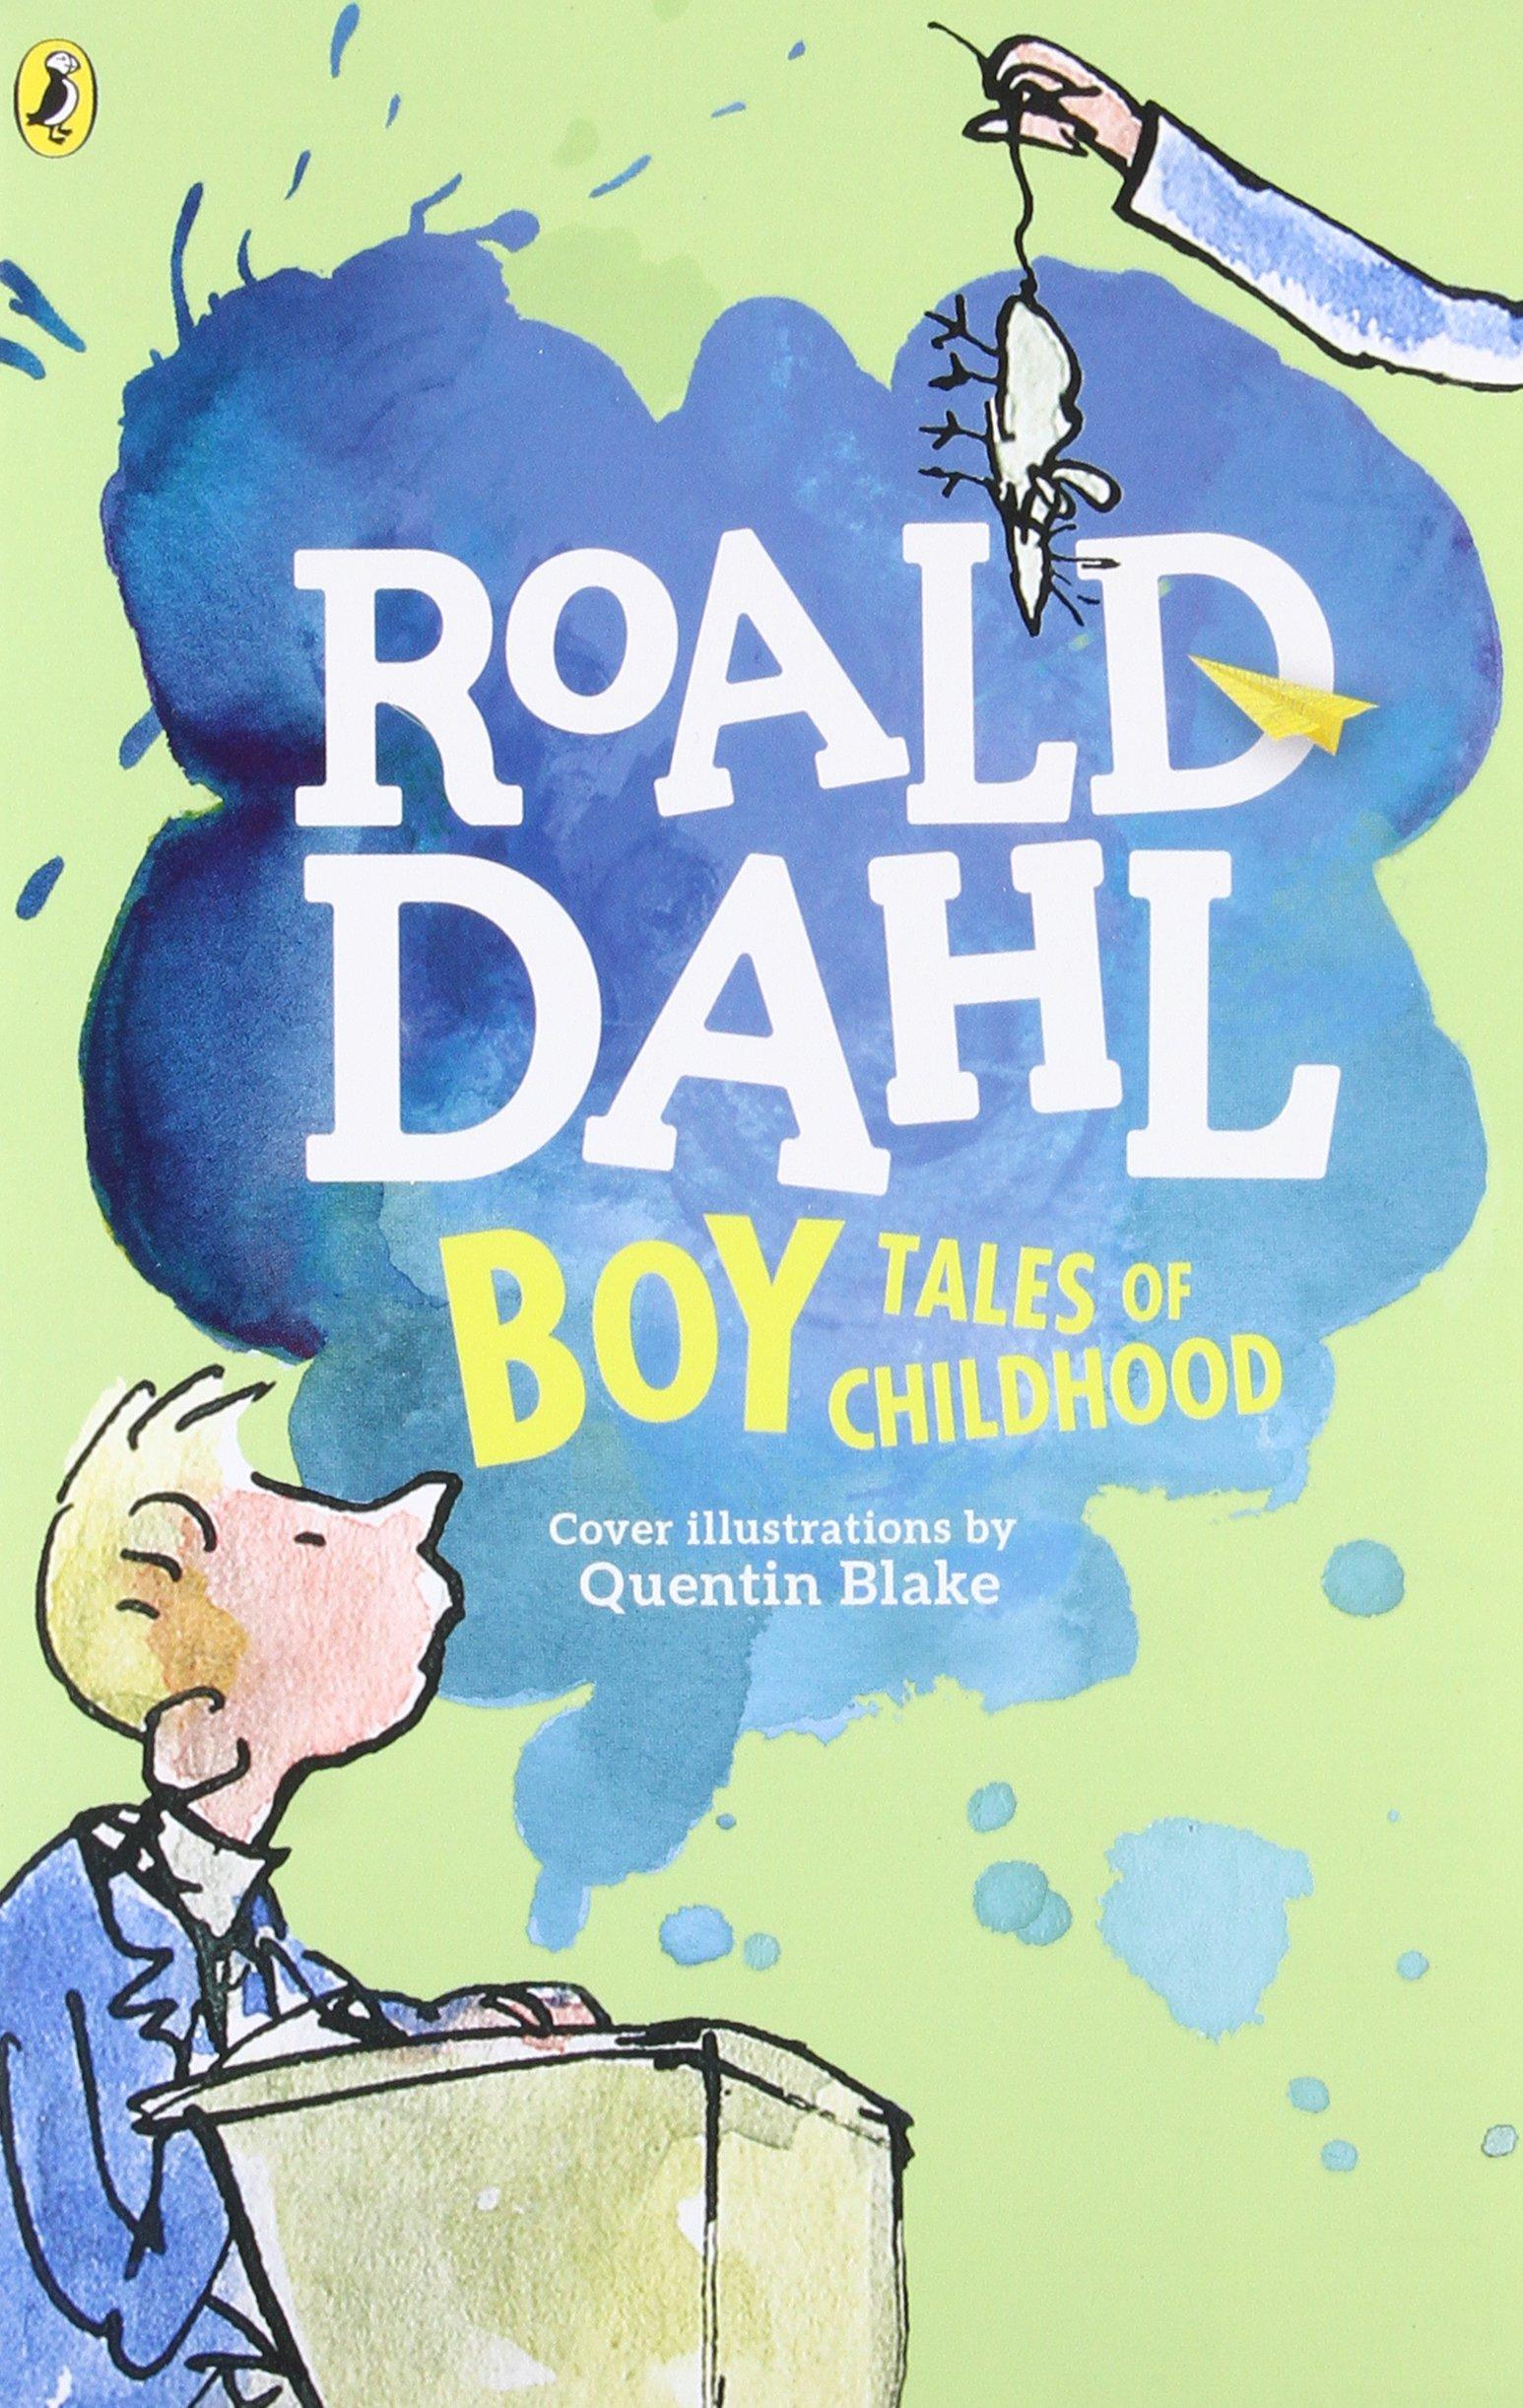 boy-tales-of-childhood